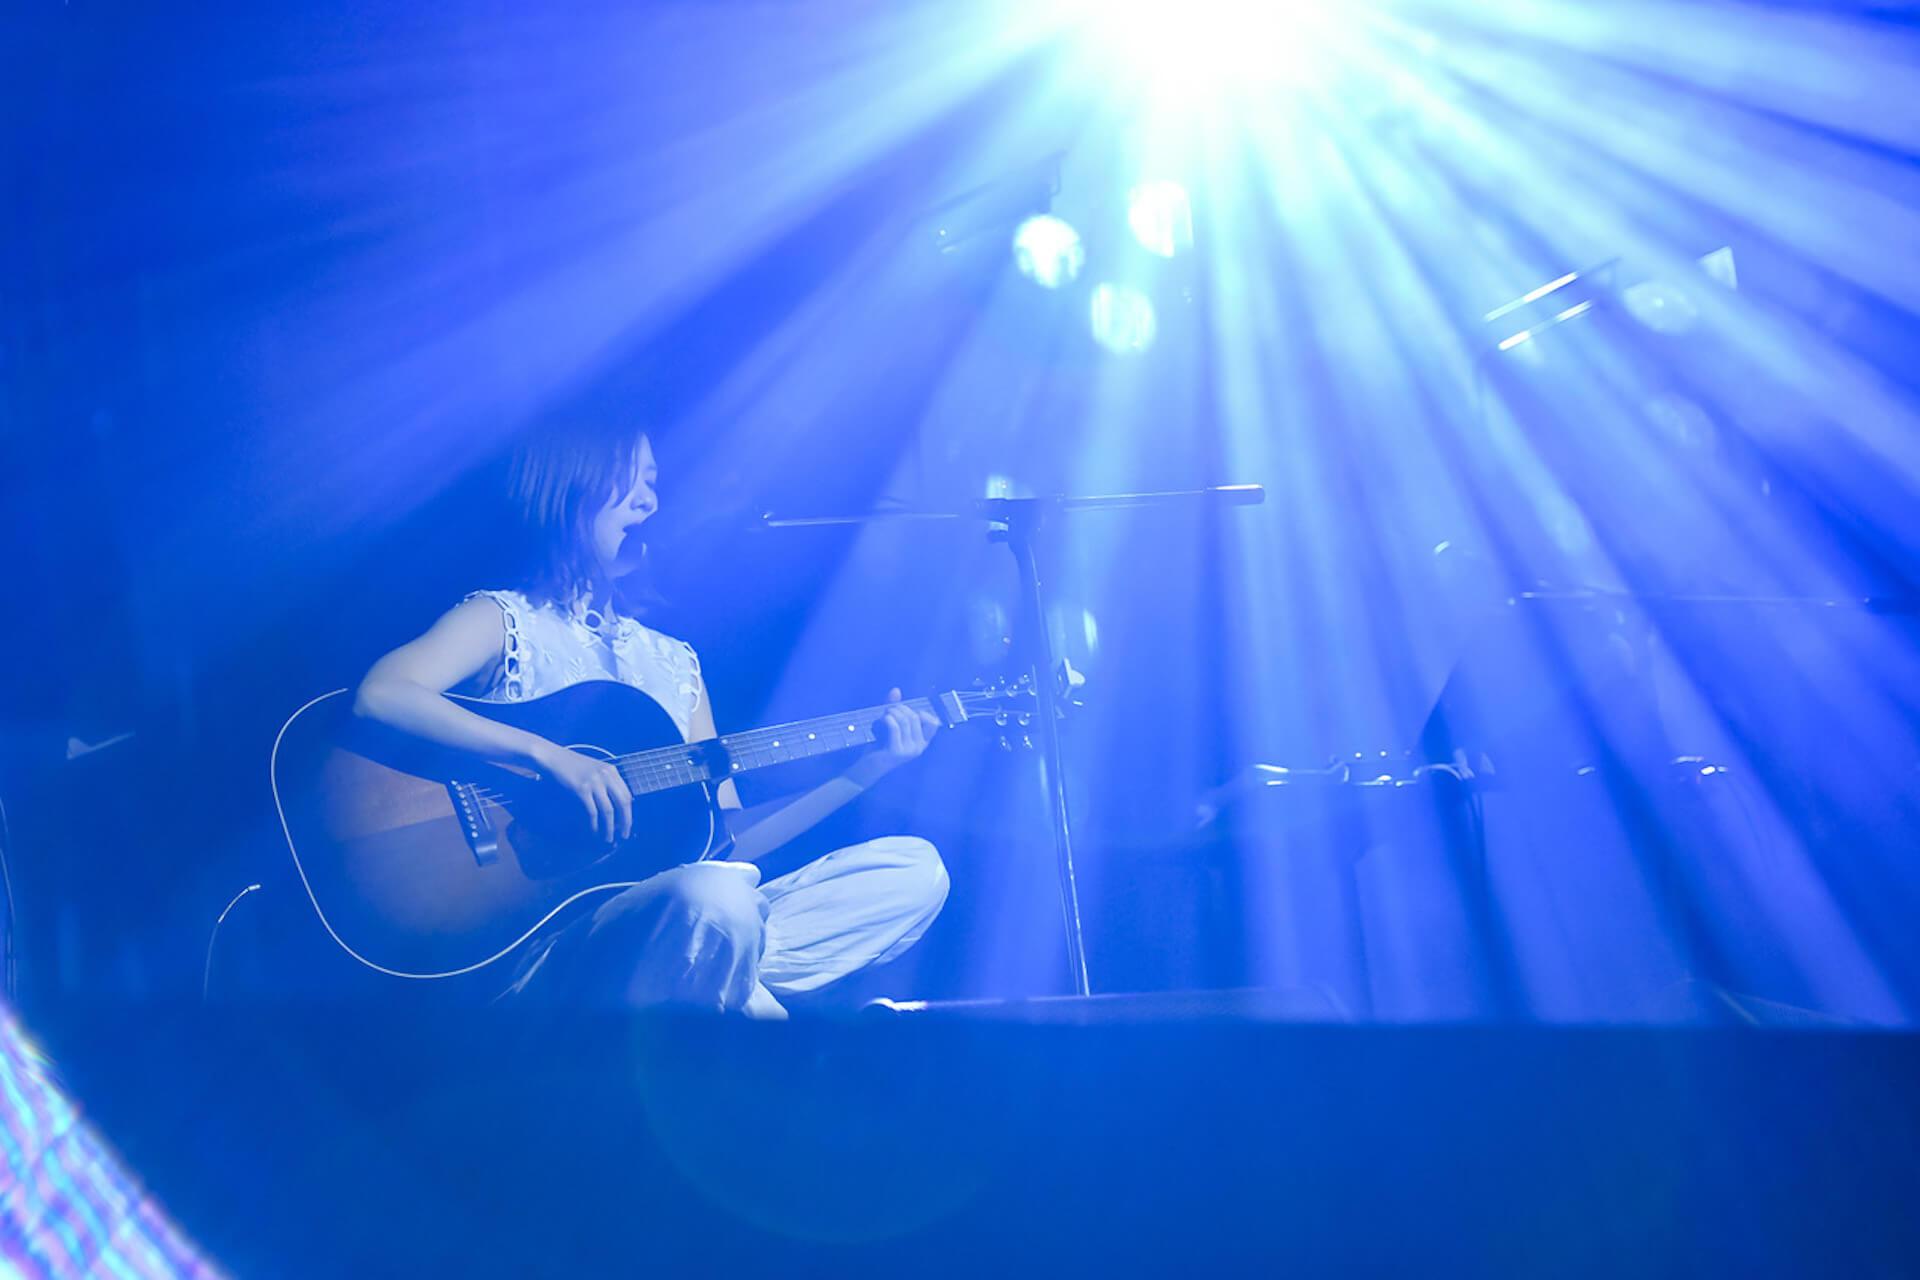 "〈TANEtoNE RECORDS〉の設立を発表した湯木慧が『光を追いかけて』主題歌を書き下ろし!""心解く""が起用決定 film210612_yukiakira_1"